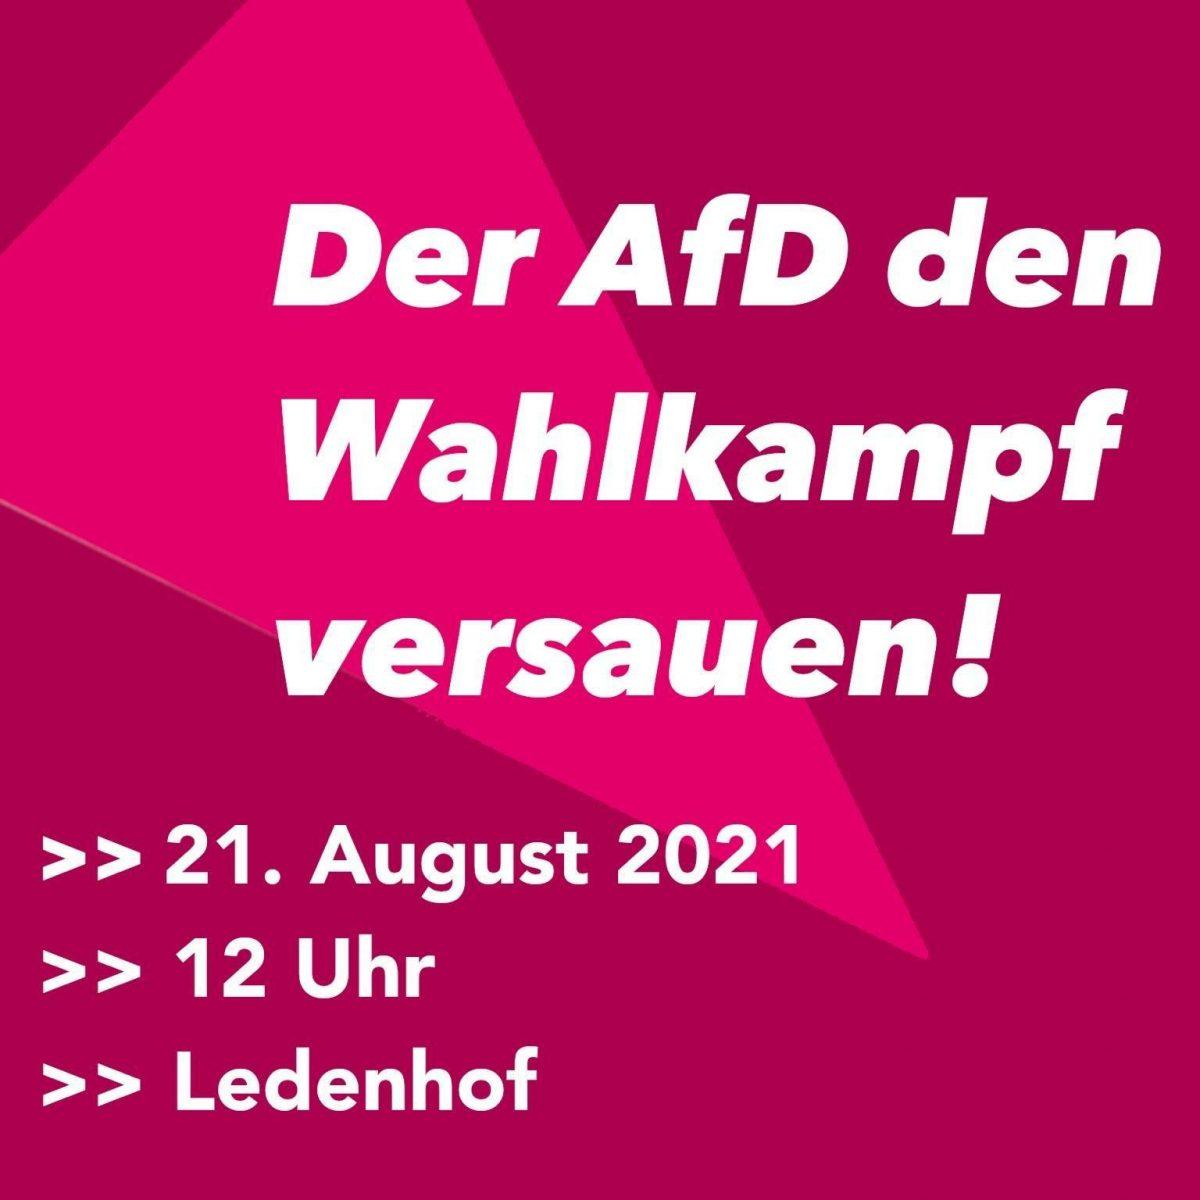 ALERTA! AfD-Veranstaltung am kommenden Samstag in Osnabrück!